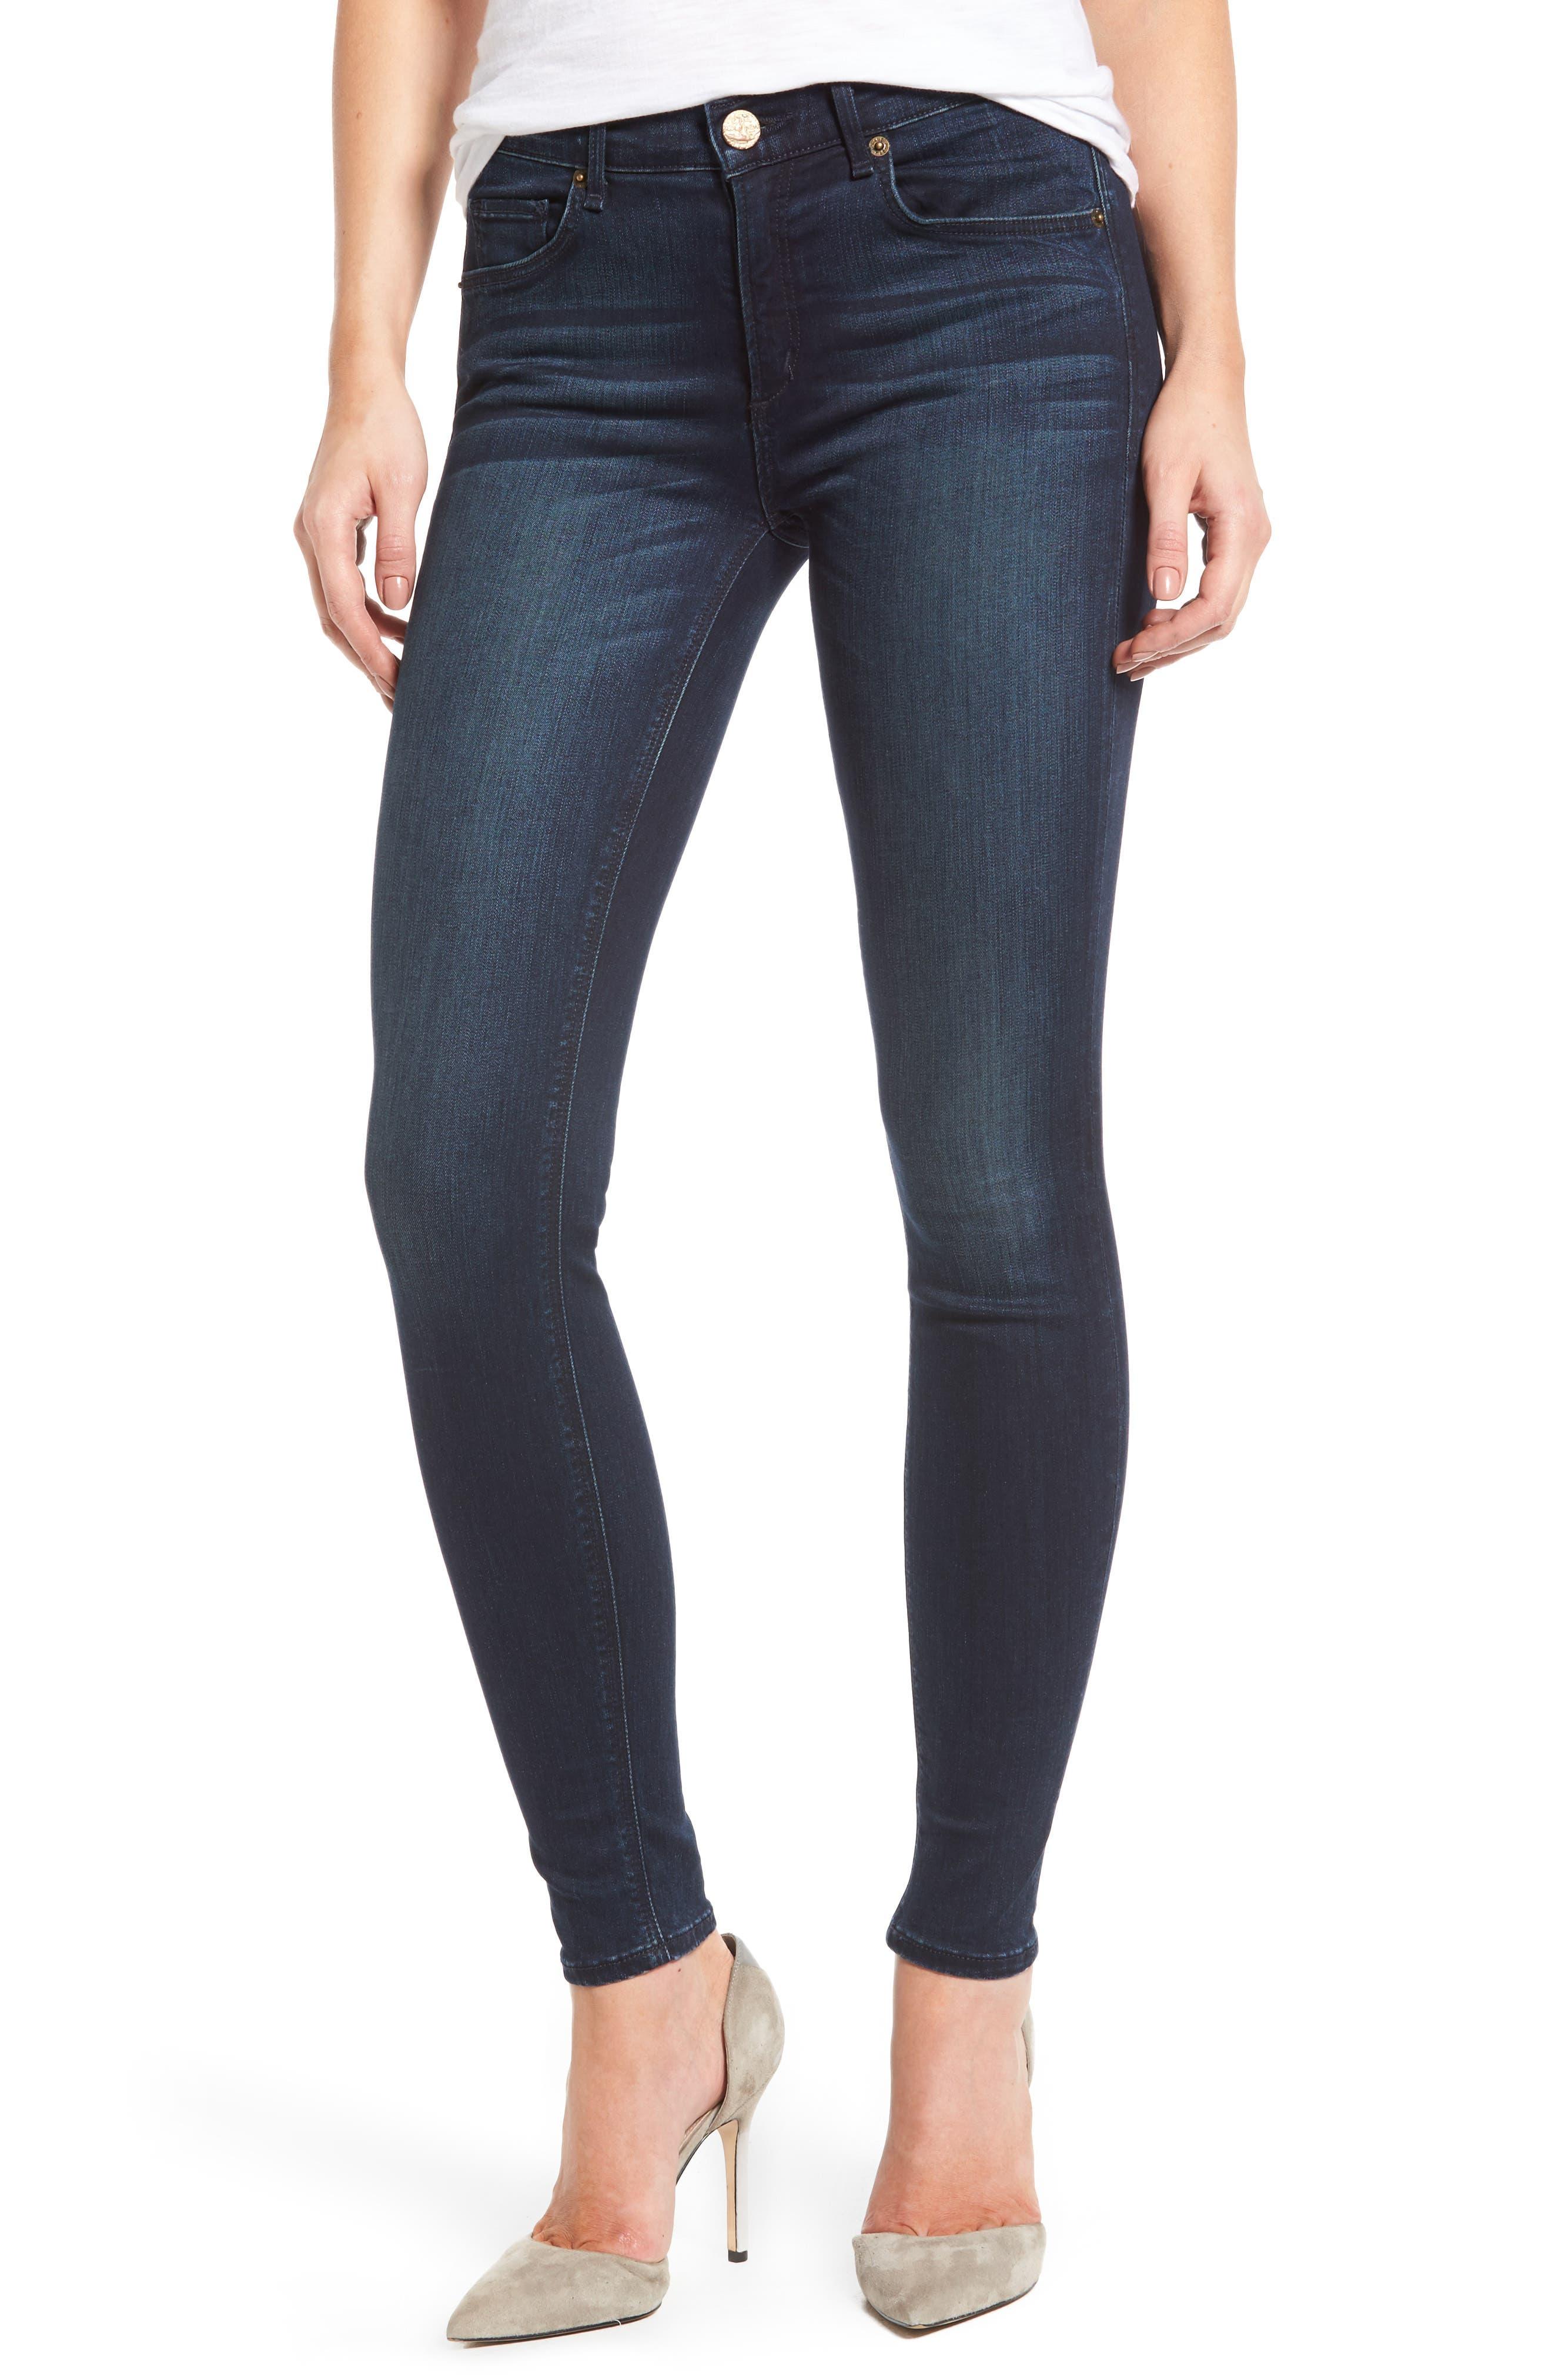 Newton Skinny Jeans,                             Main thumbnail 1, color,                             457